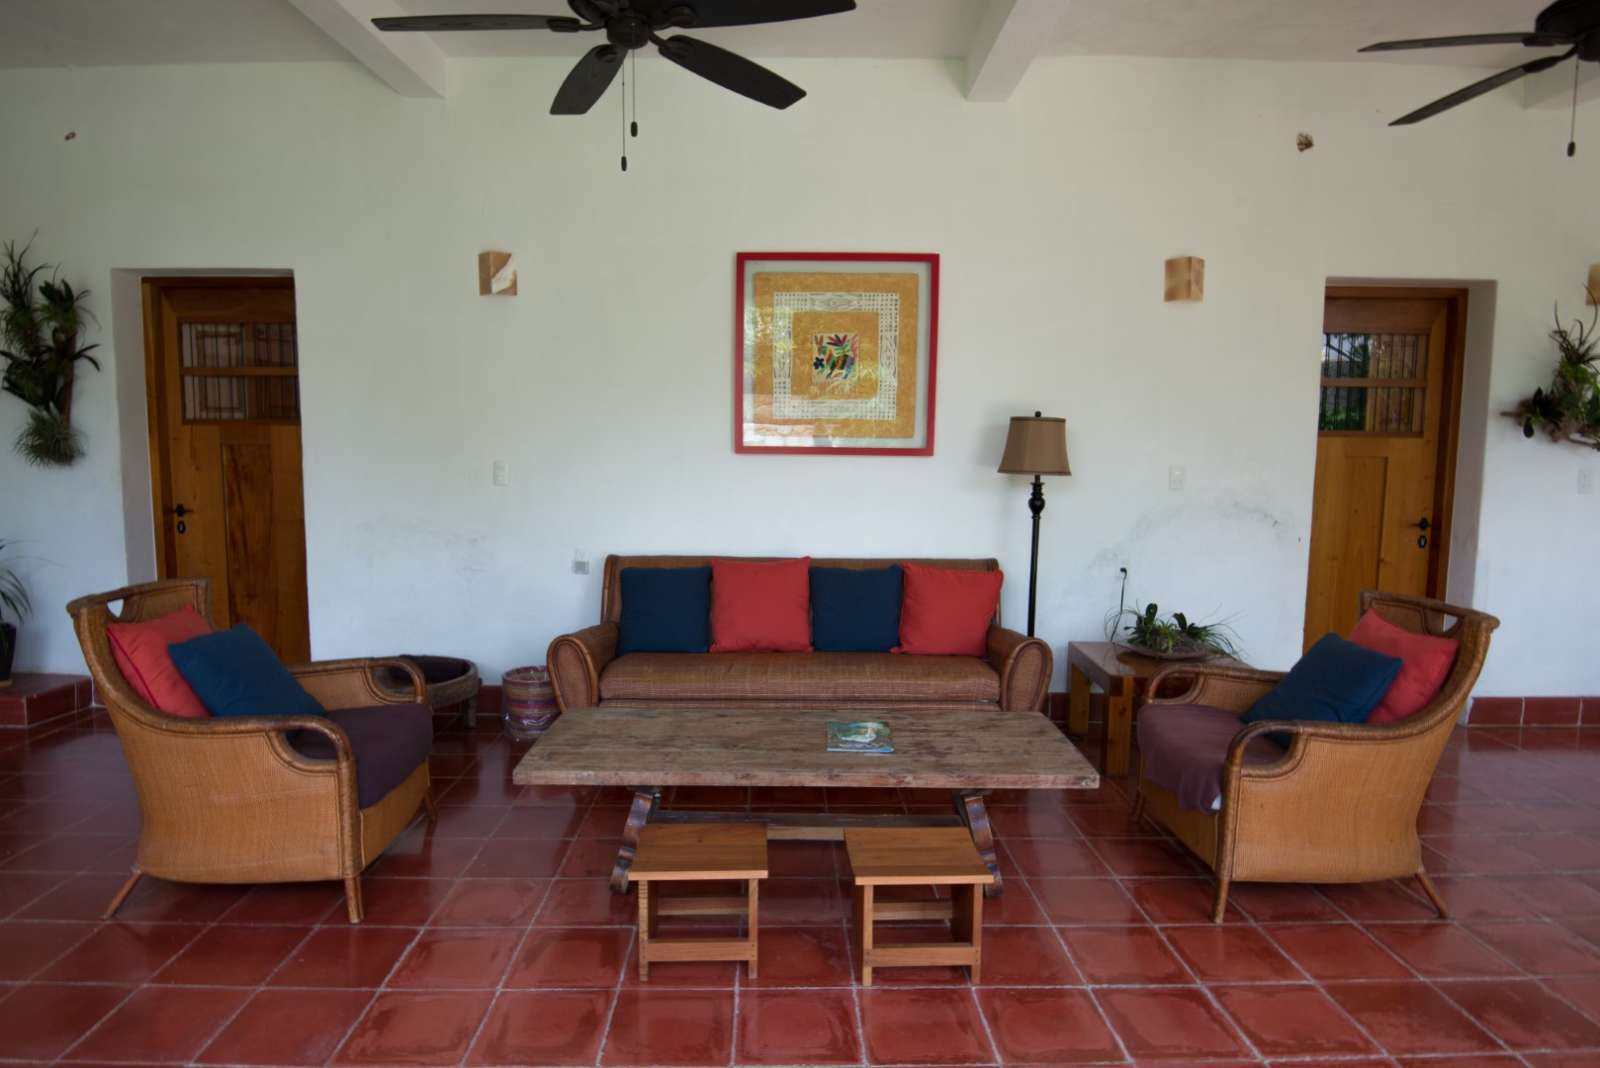 Seating area at Posada San Juan Valladolid